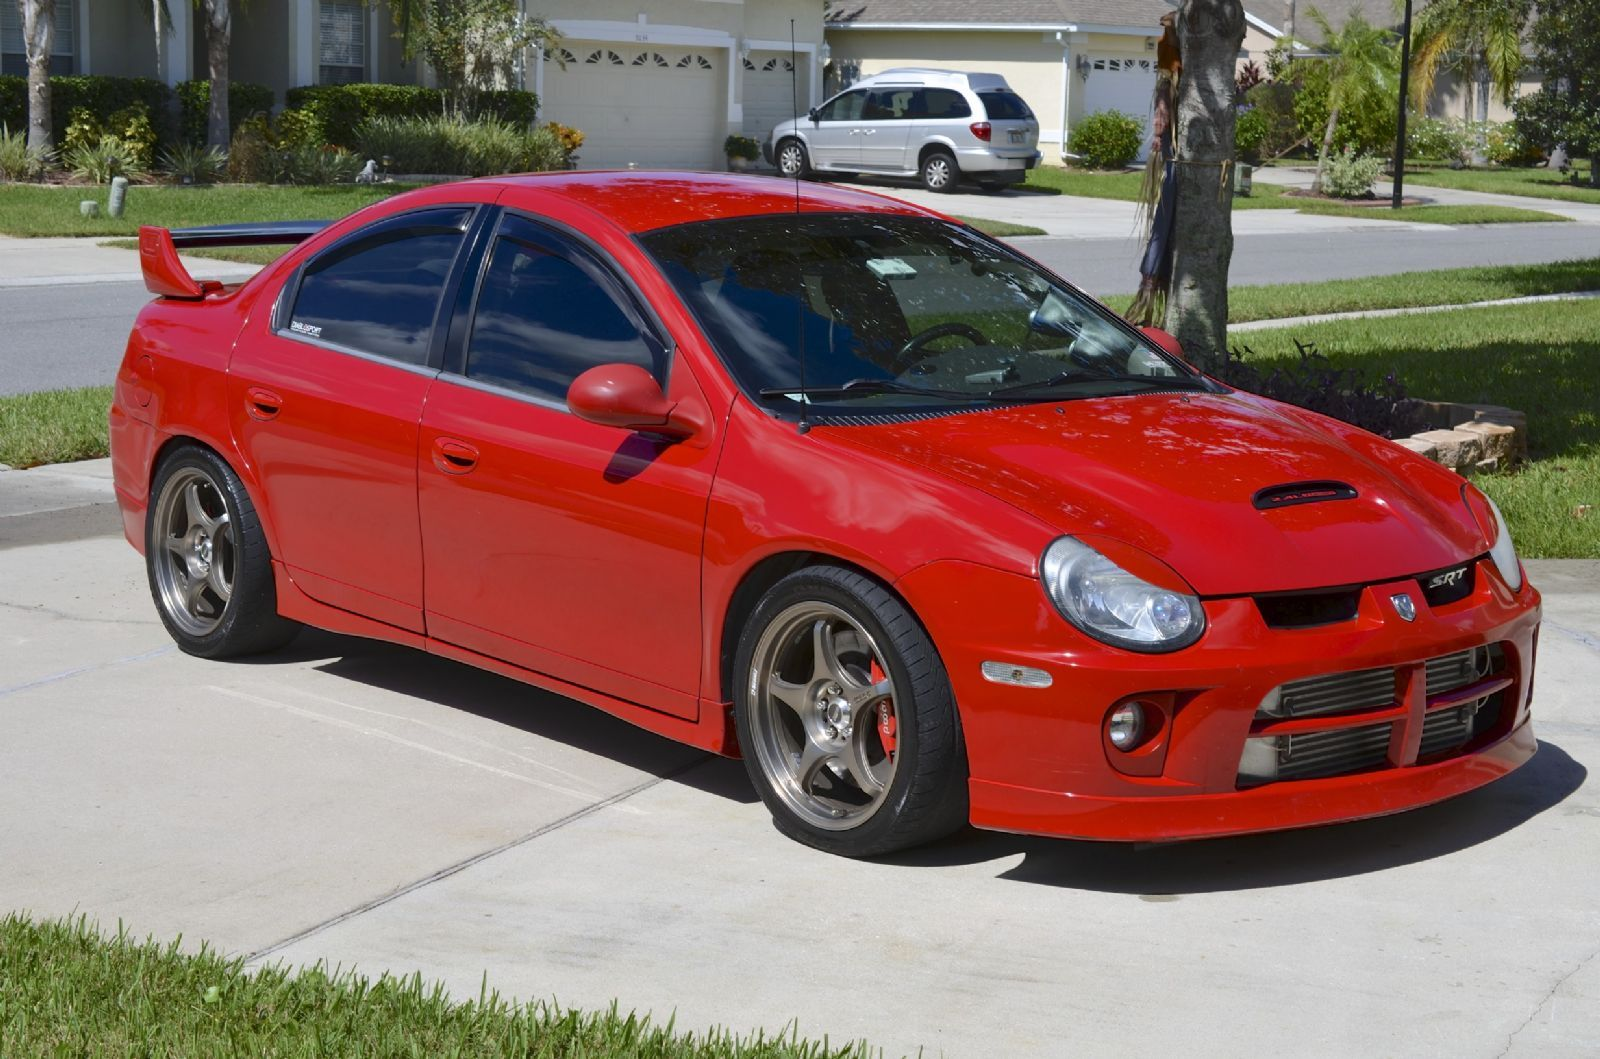 41+ Dodge srt 4 hp ideas